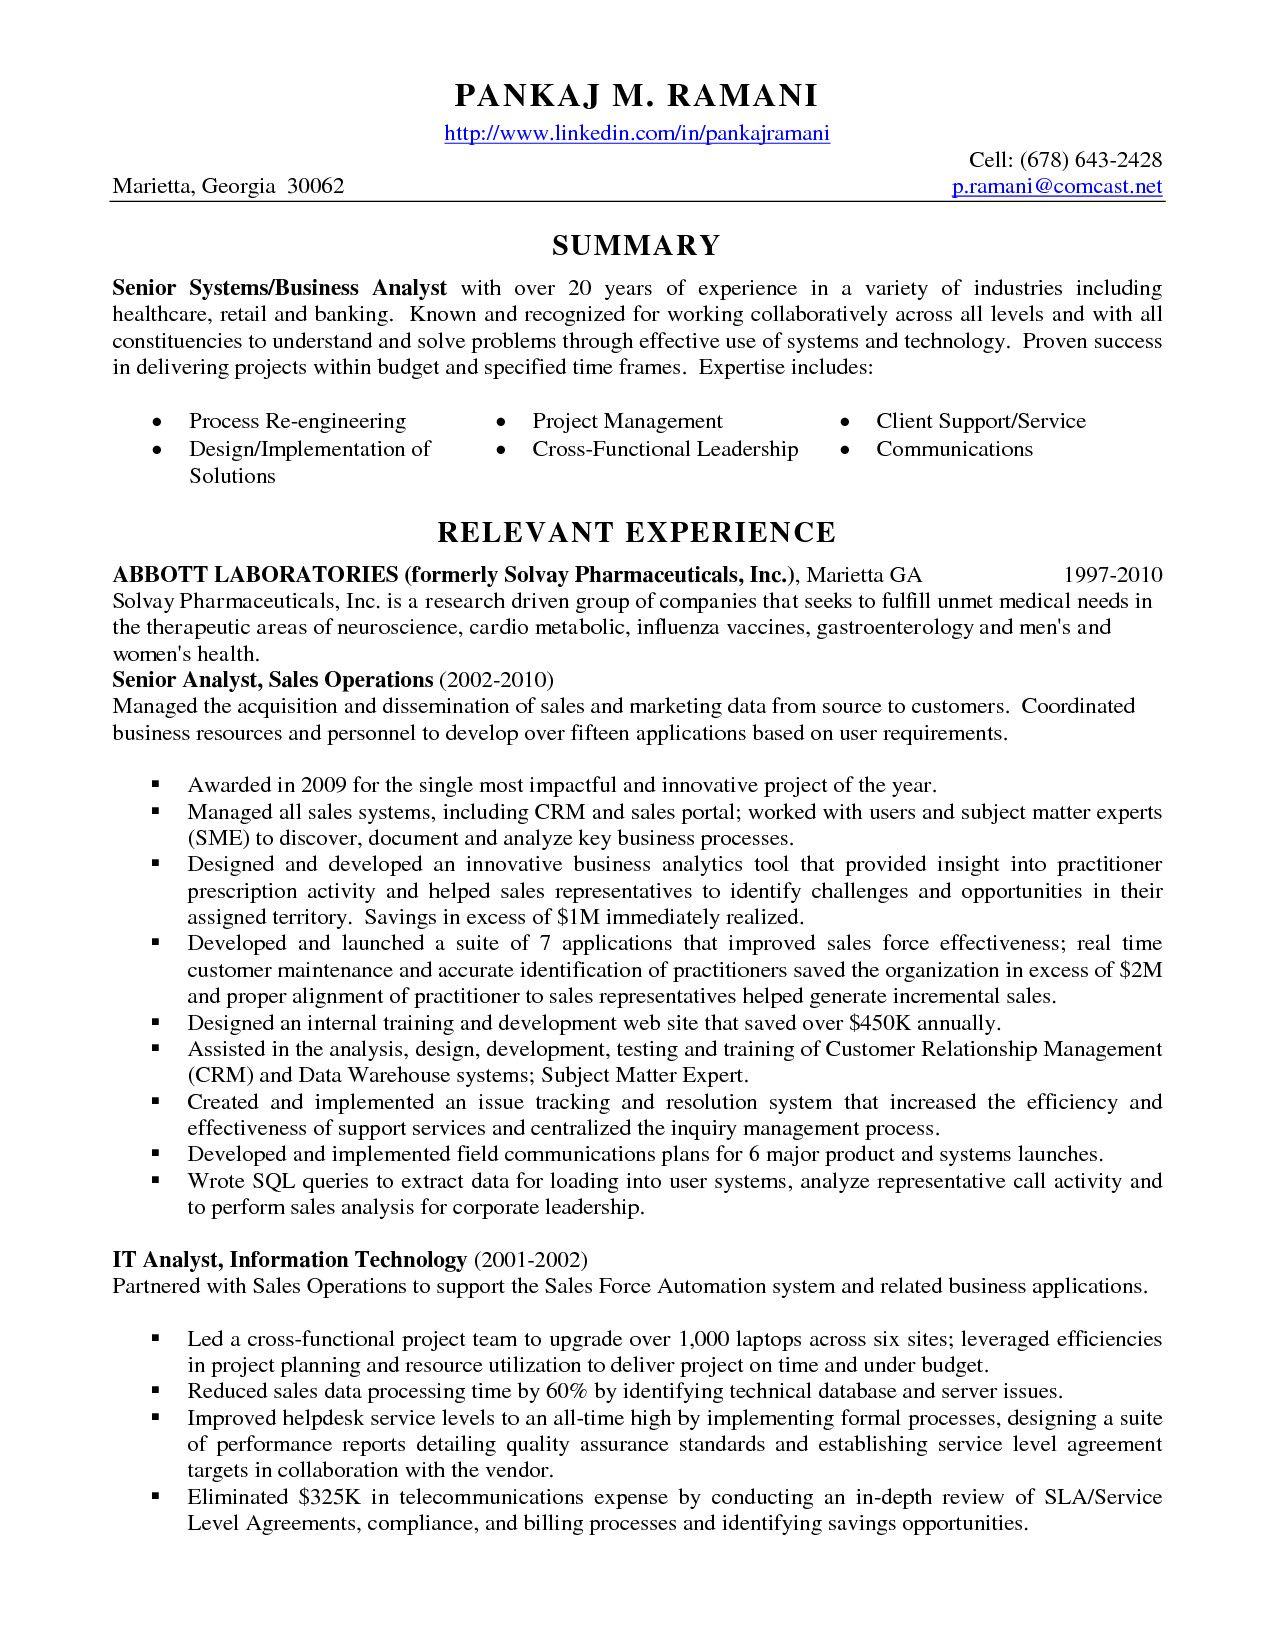 Business Analyst Resume Samples Senior Data Analyst Cv Resume Format Best Resume Templates Business Analyst Resume Business Analyst Data Analyst